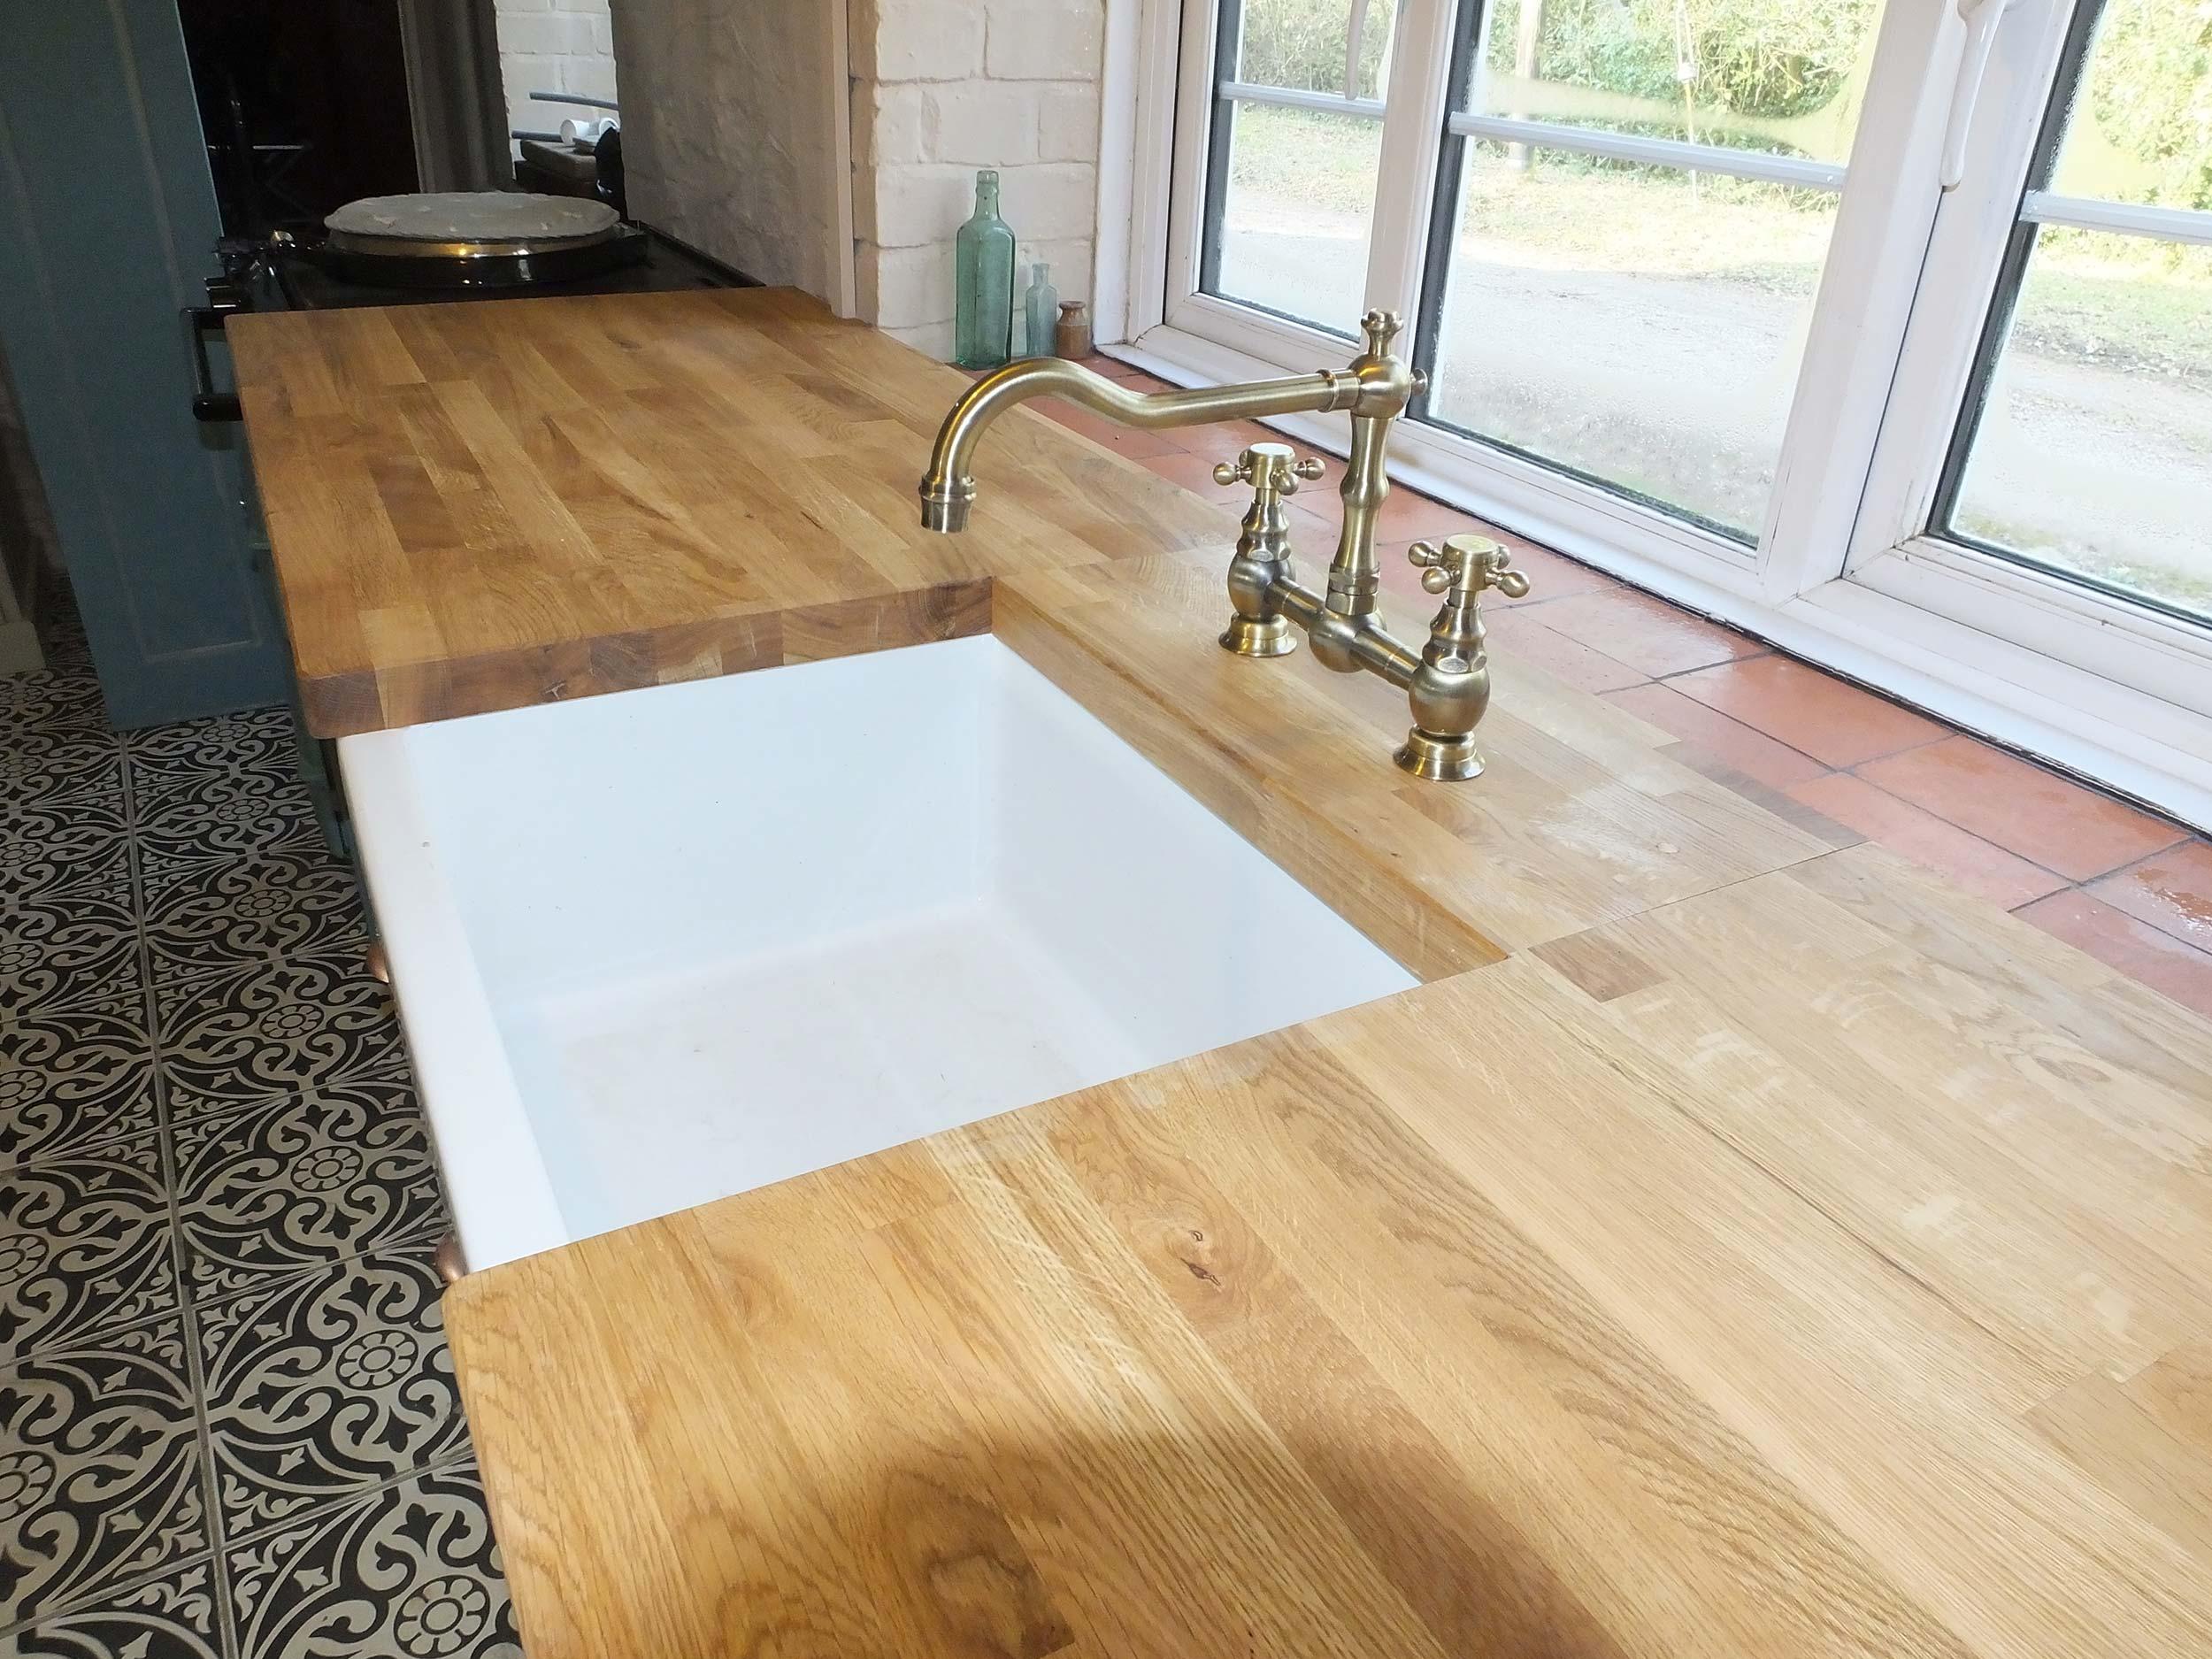 Solid Oak Stave Worktop with Belfast Sink